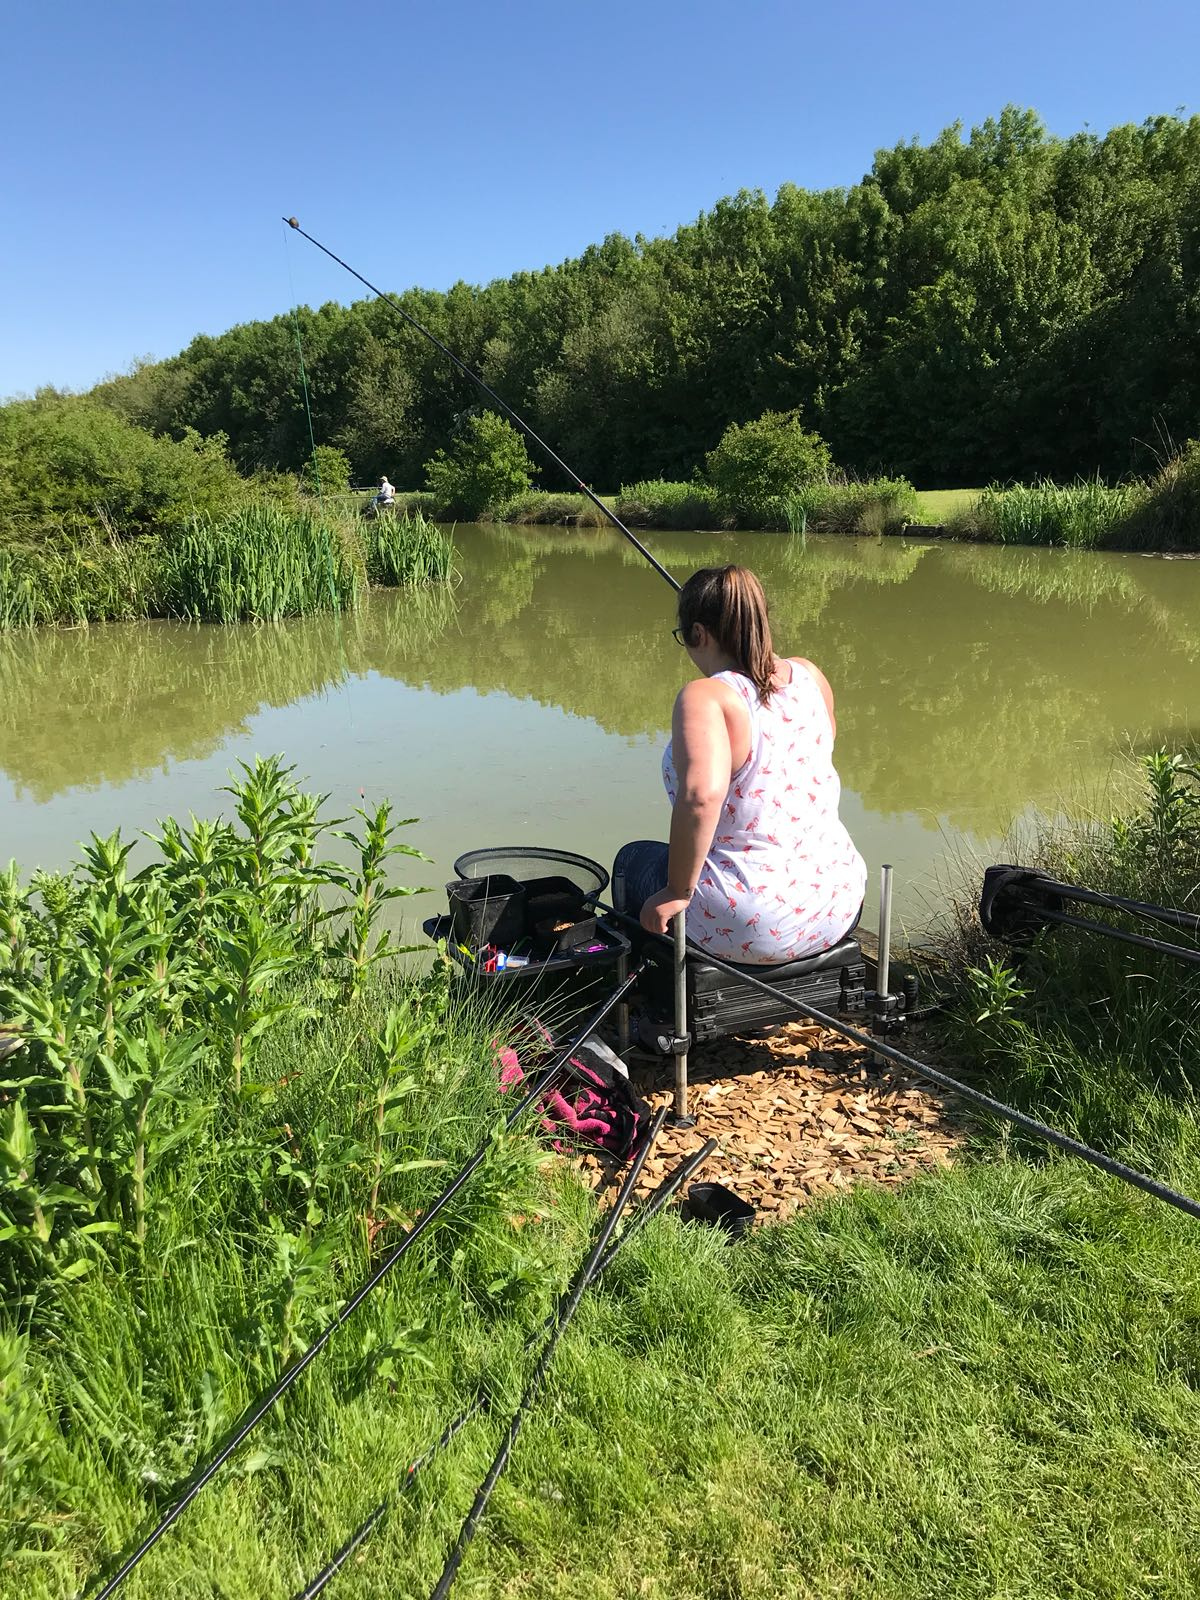 Get Fishing | Amelia Taverna - This Girl Can 3